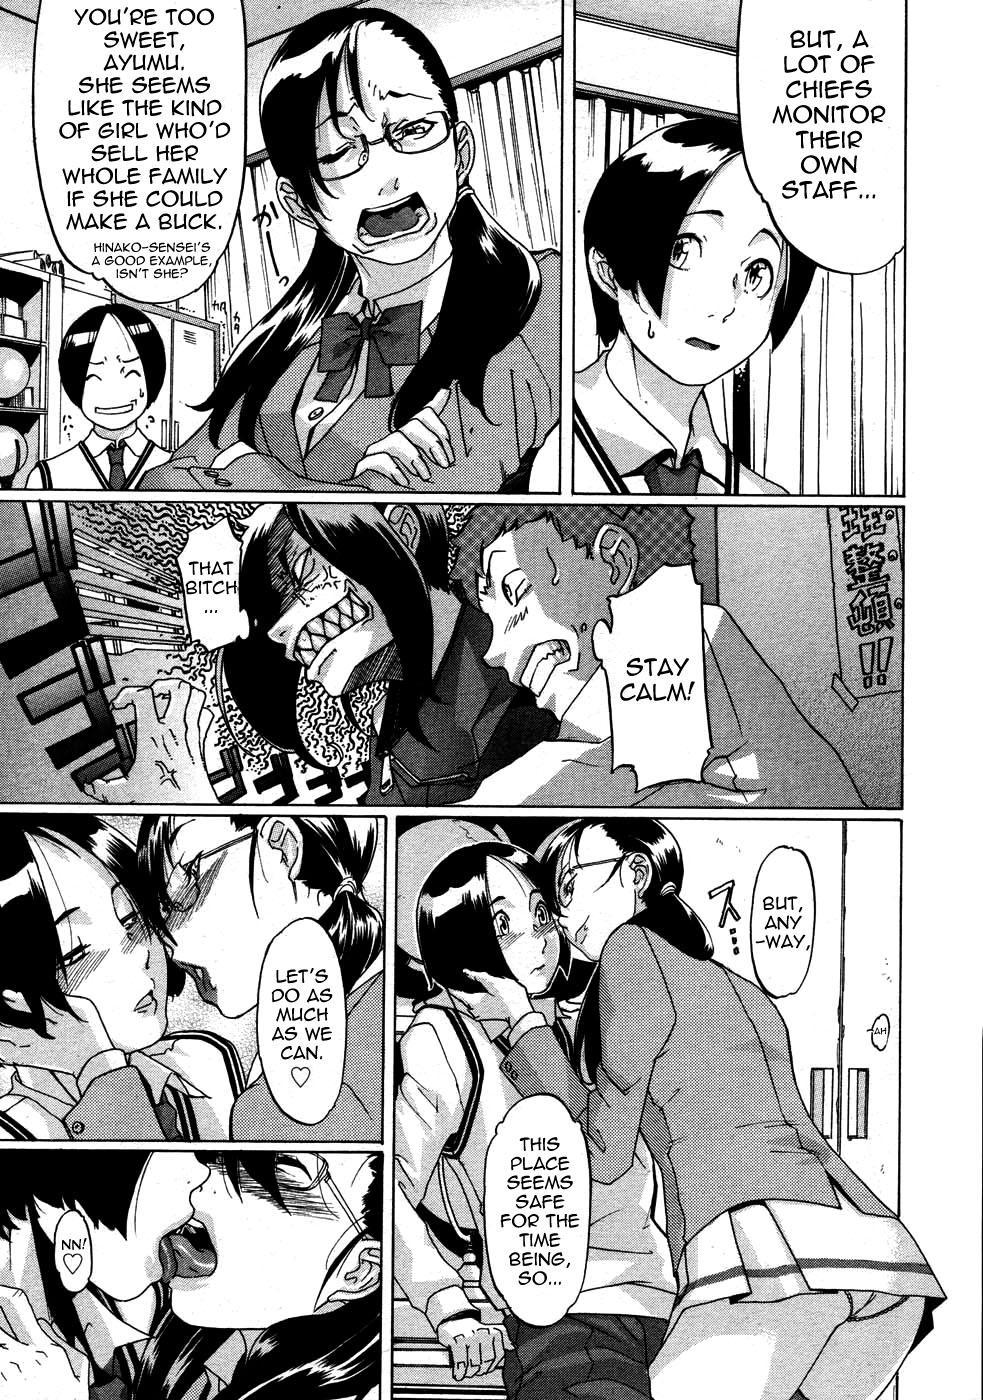 [Royal Koyanagi] Milky Shot! (School Is Crazy these Days) Ch.1-2 [English] 16